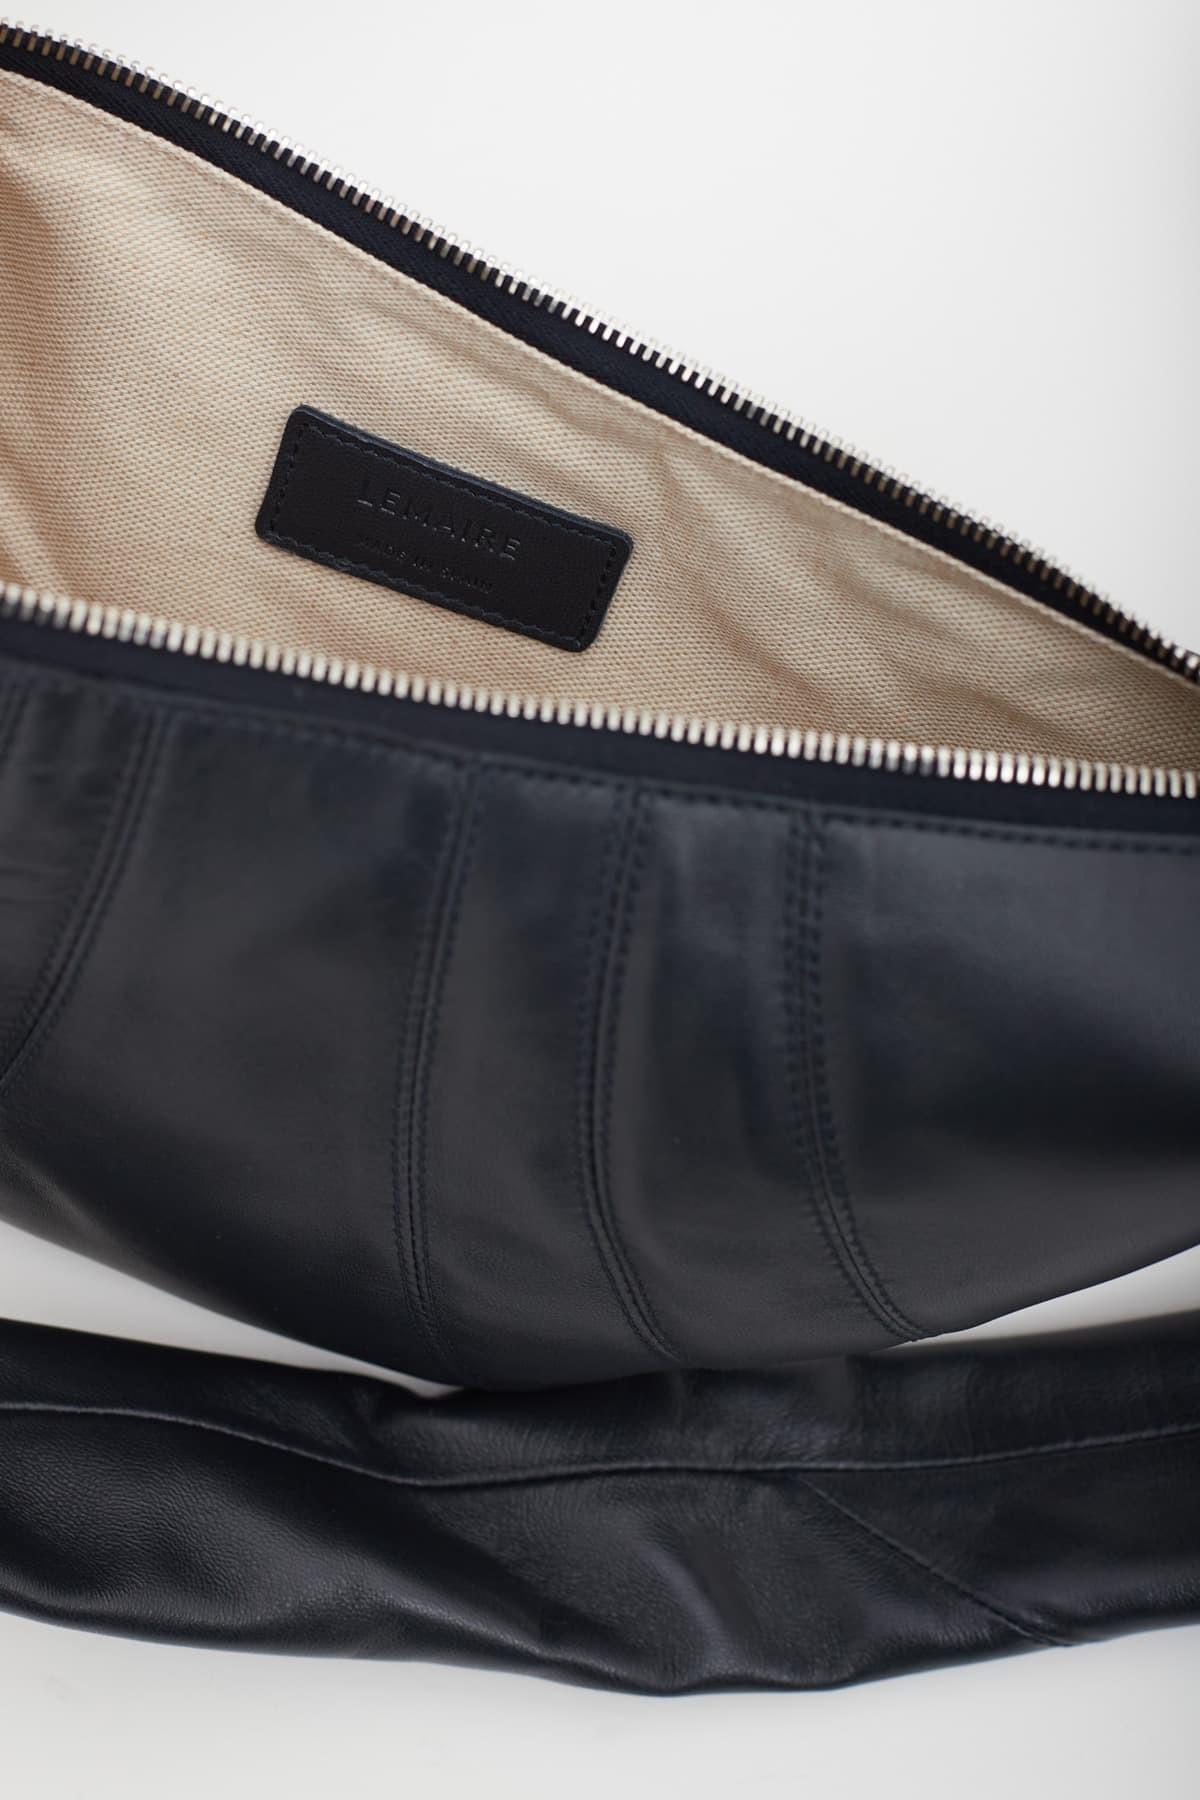 Shop Aries White Mr Cranes Girl T-Shirt